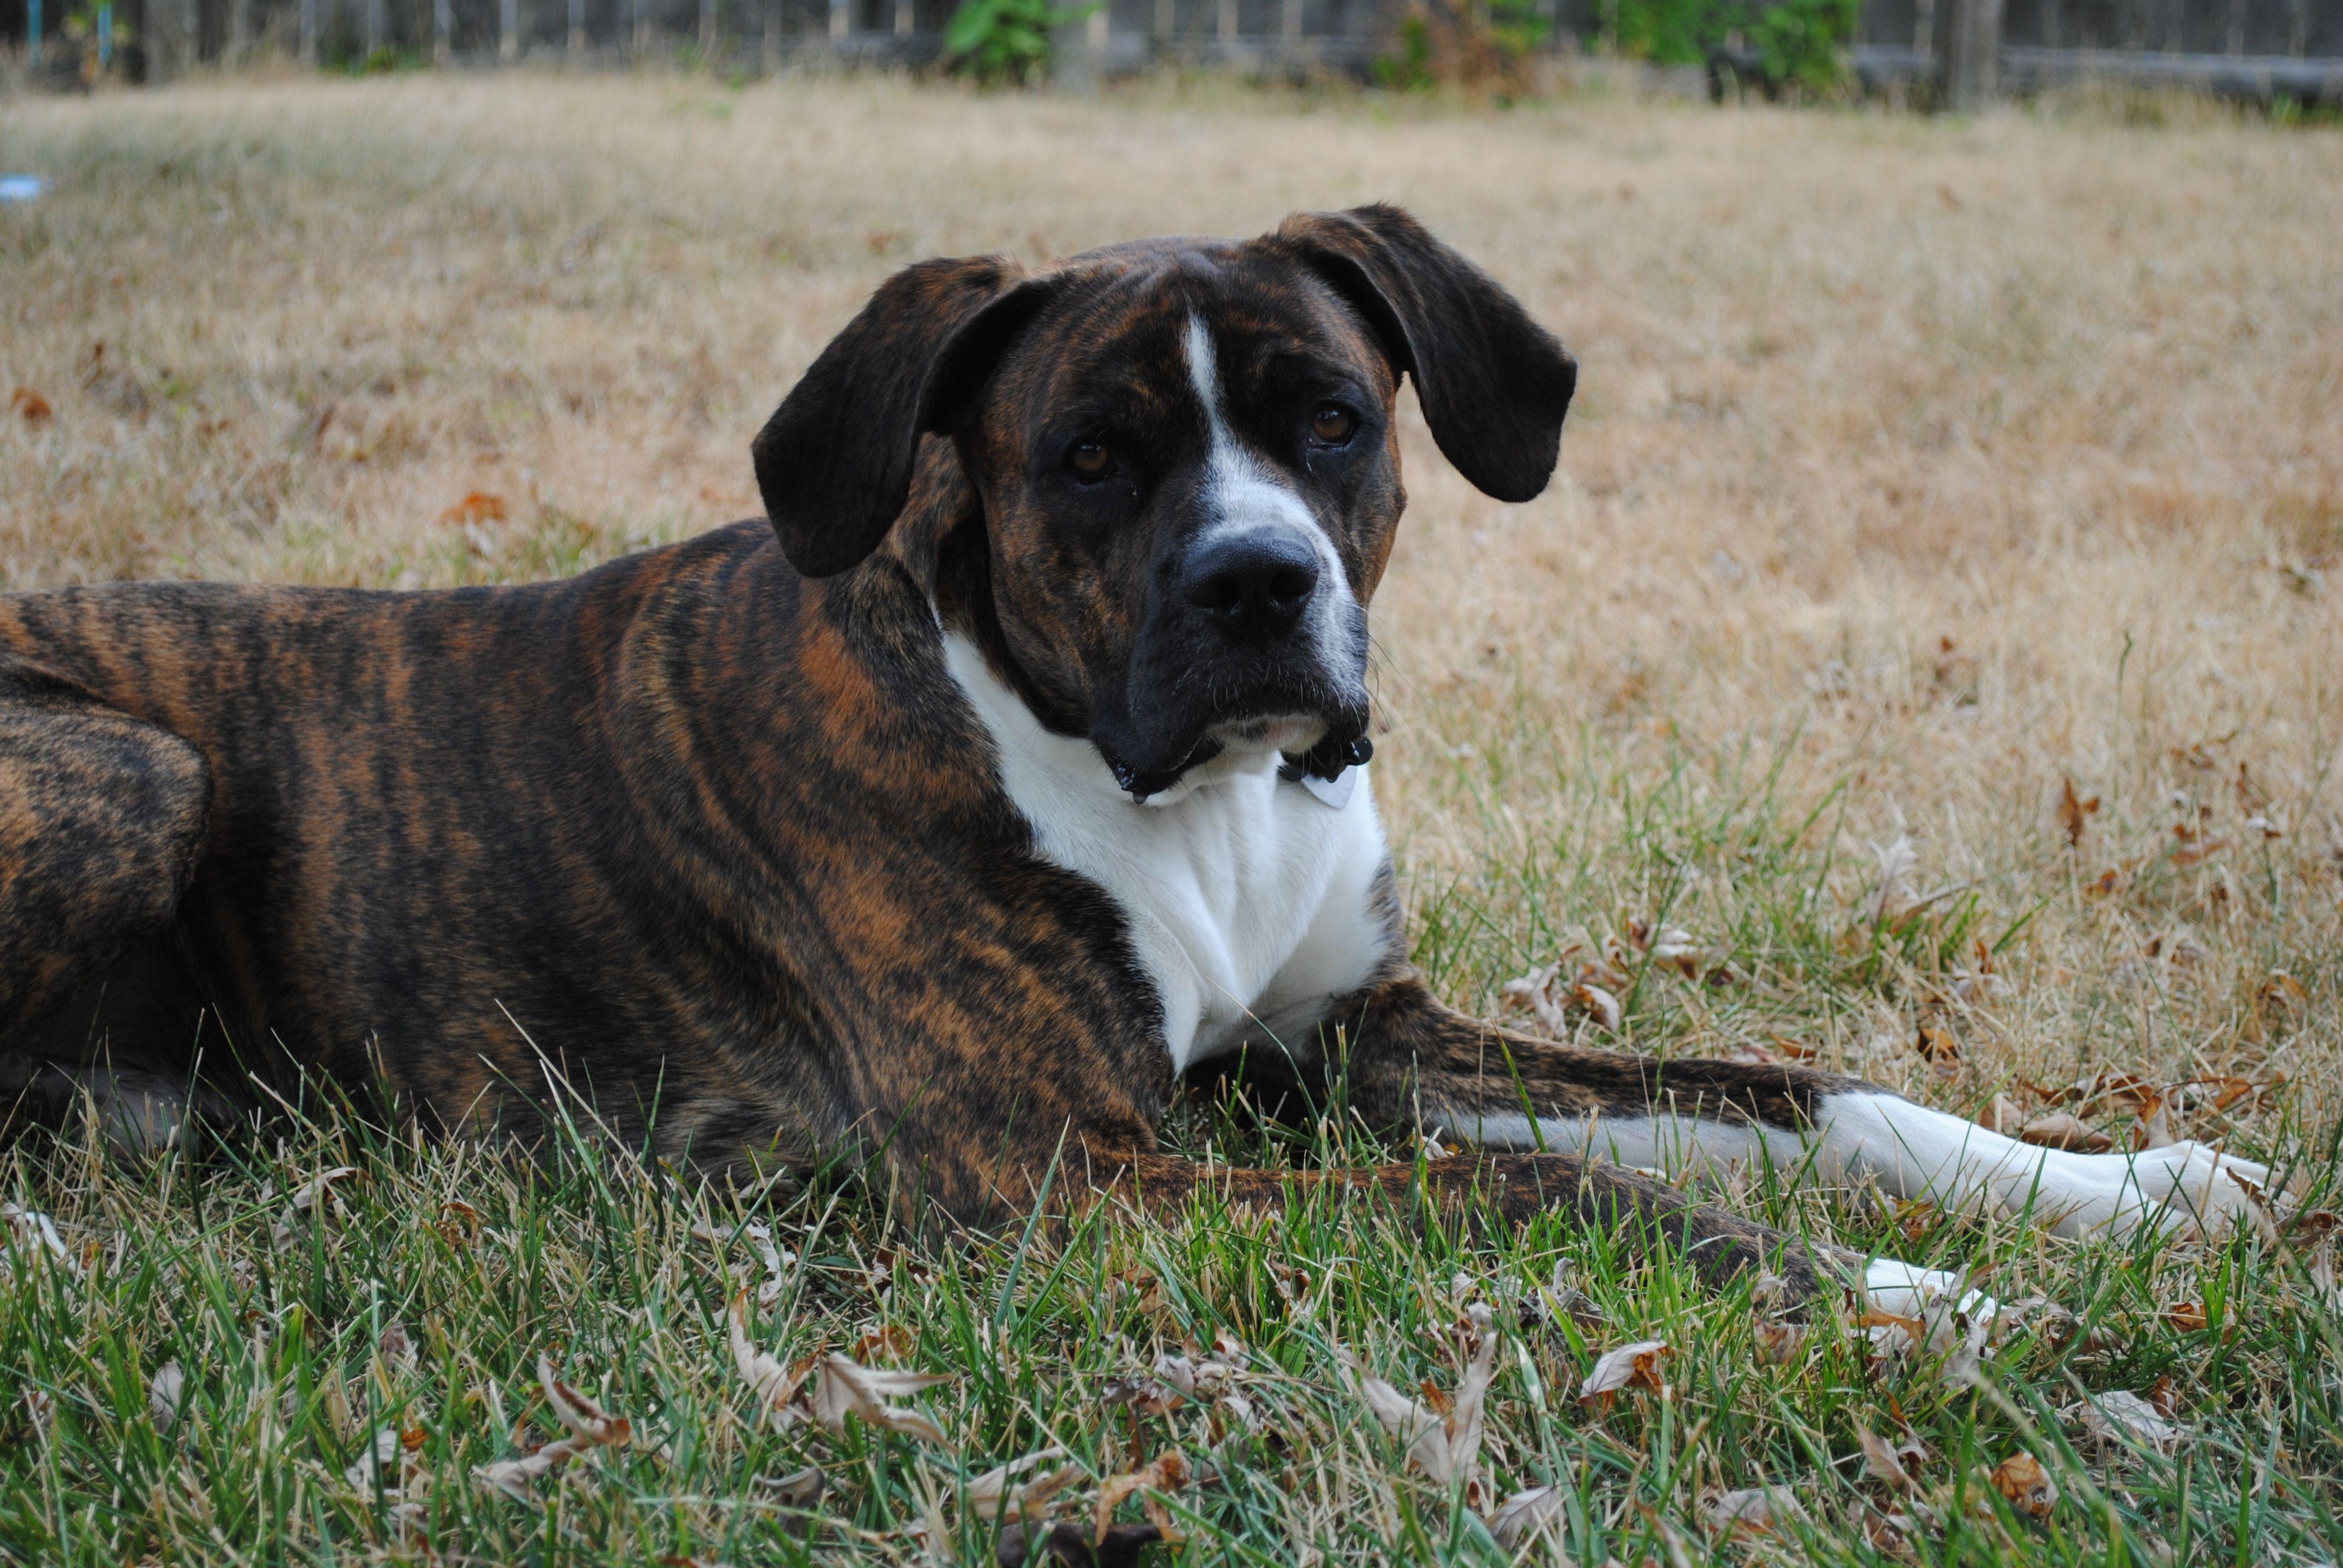 Brindle Lab | Dog Breeds Picture